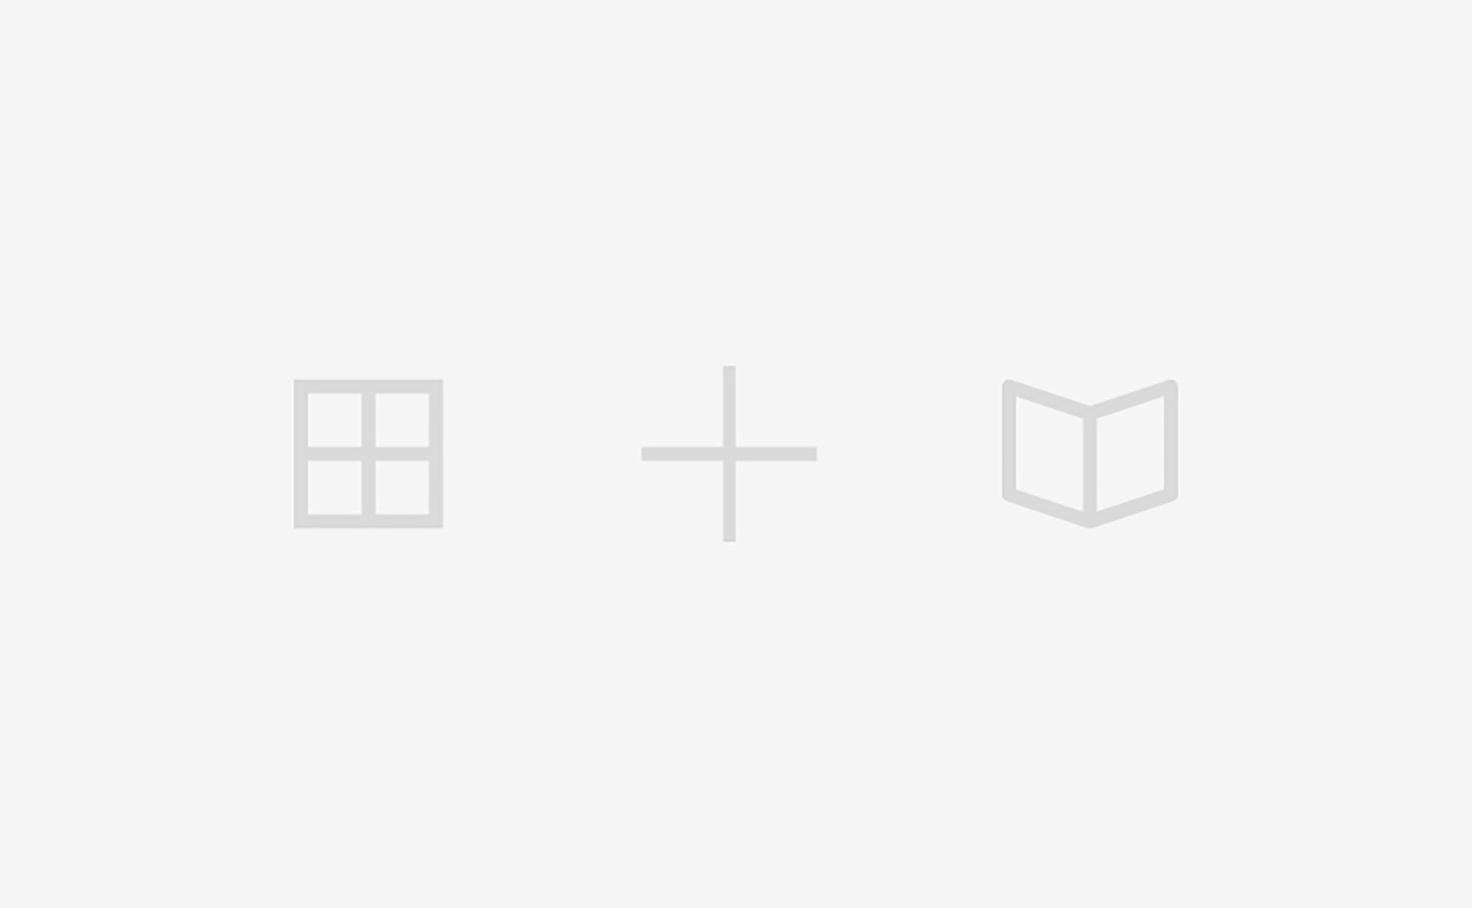 module 5 assignment - sharath | Tableau Public